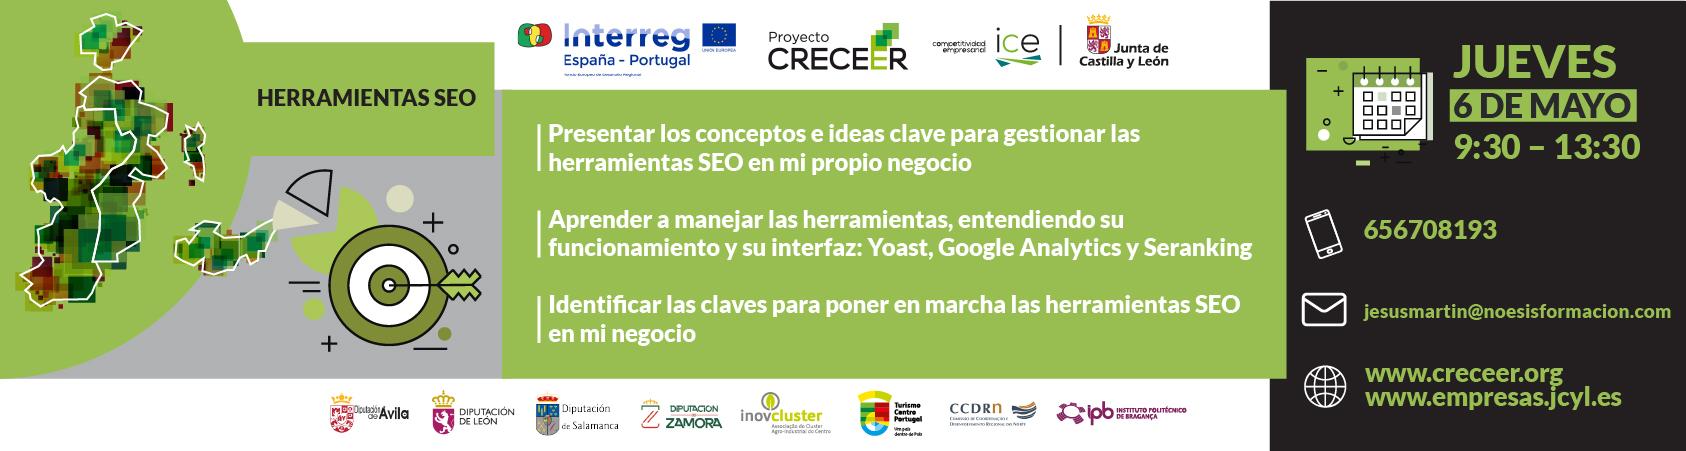 HERRAMIENTAS SEO_carrusel